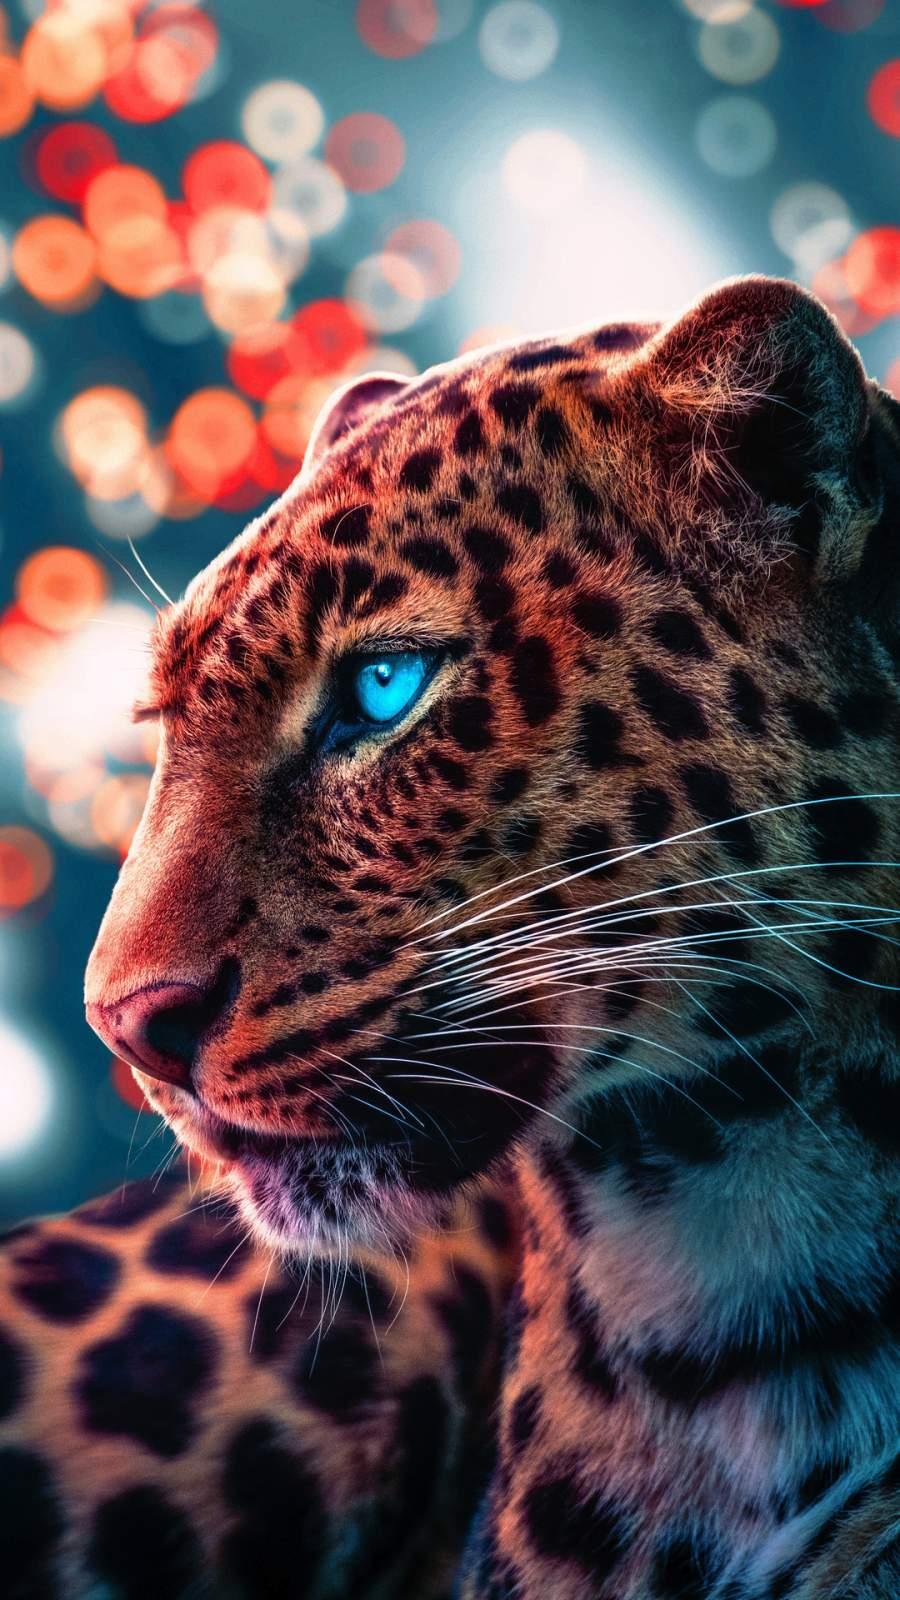 Cheetah Magical Eyes iPhone Wallpaper